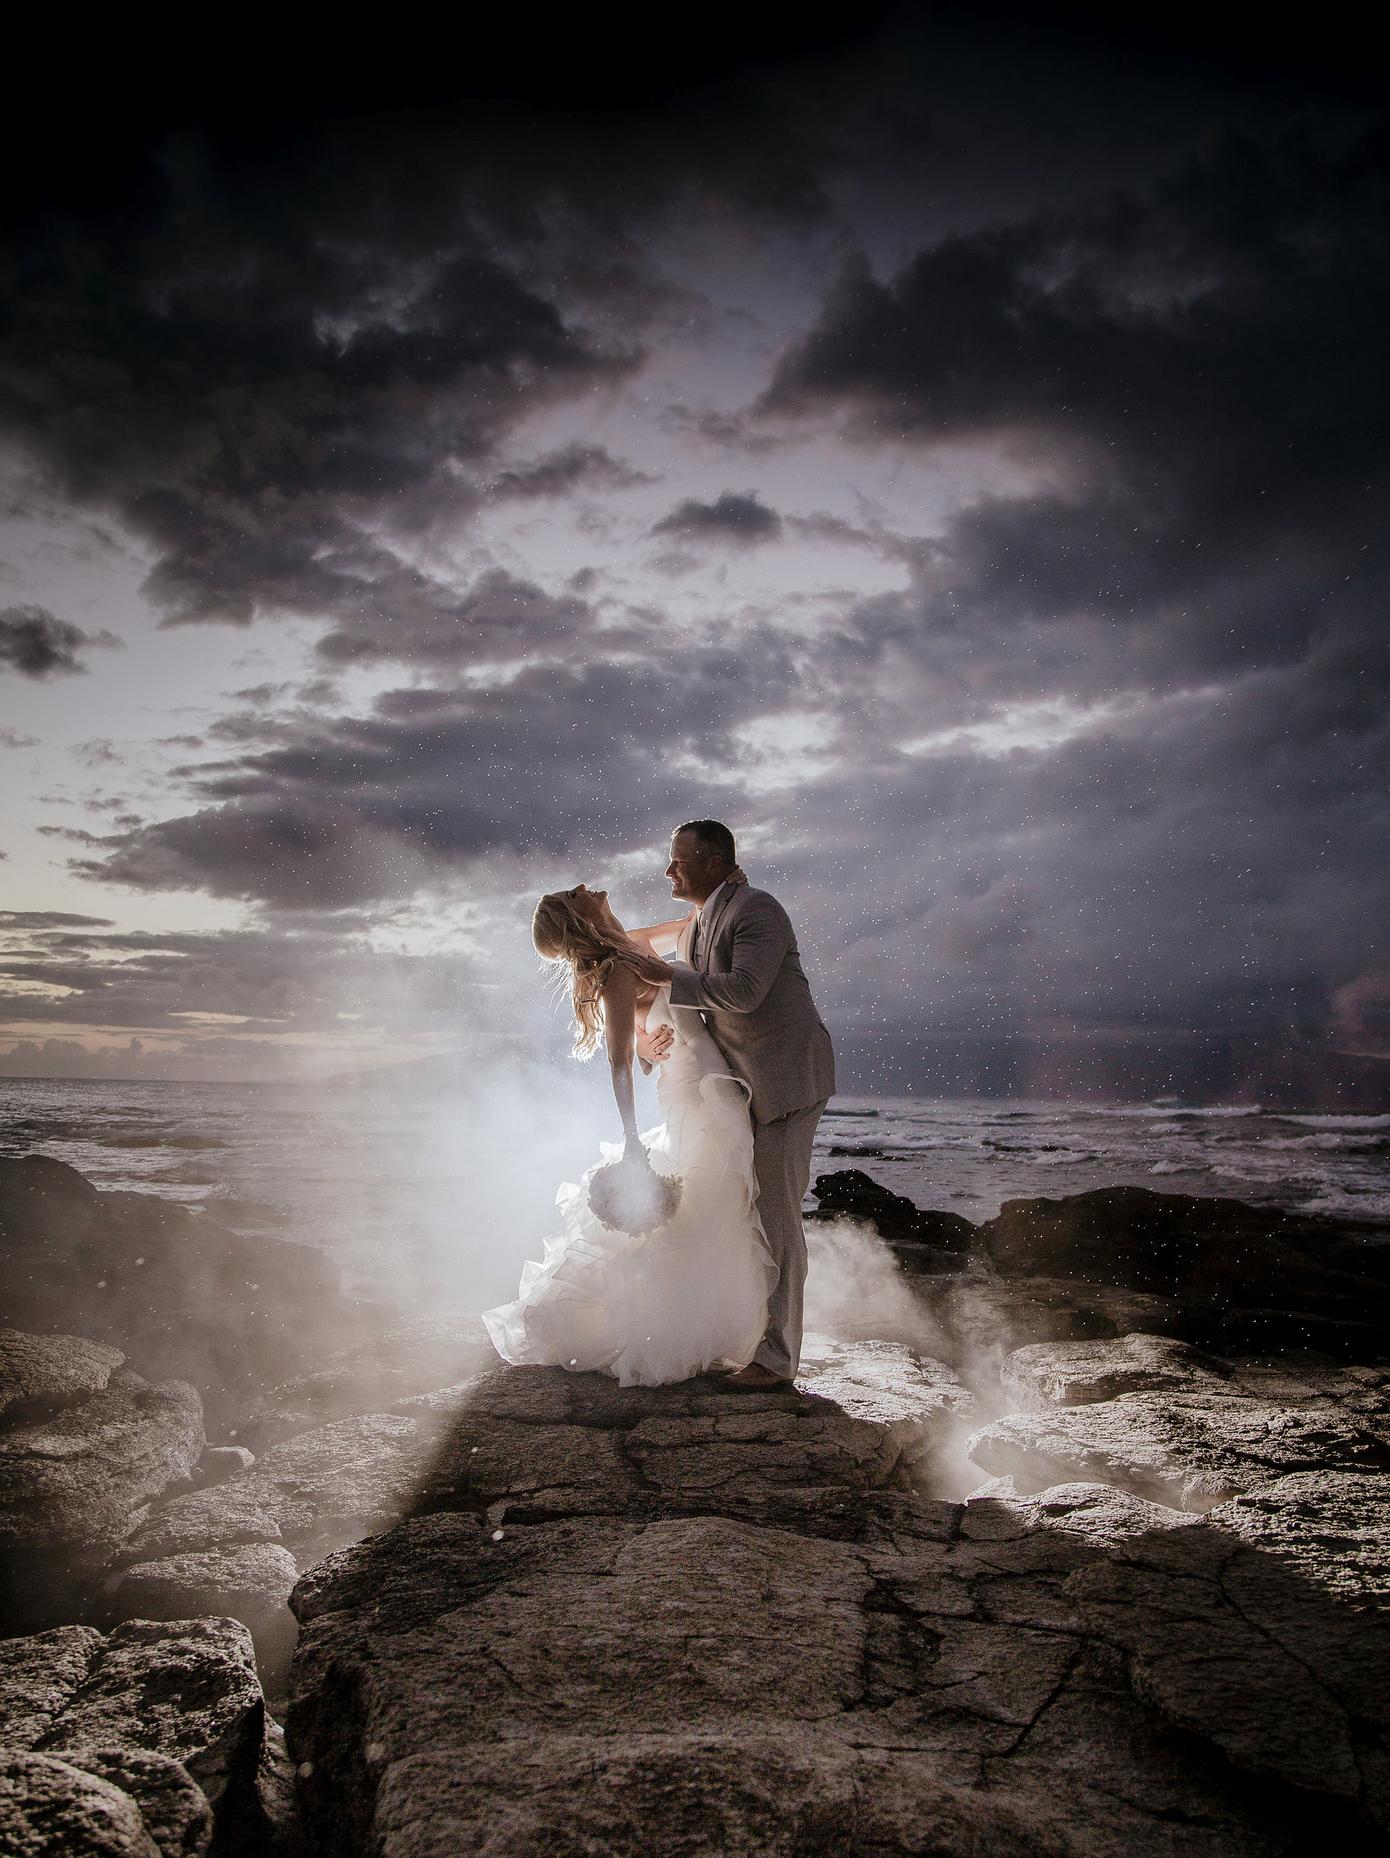 chris-j-evans-rain-wedding00005.png